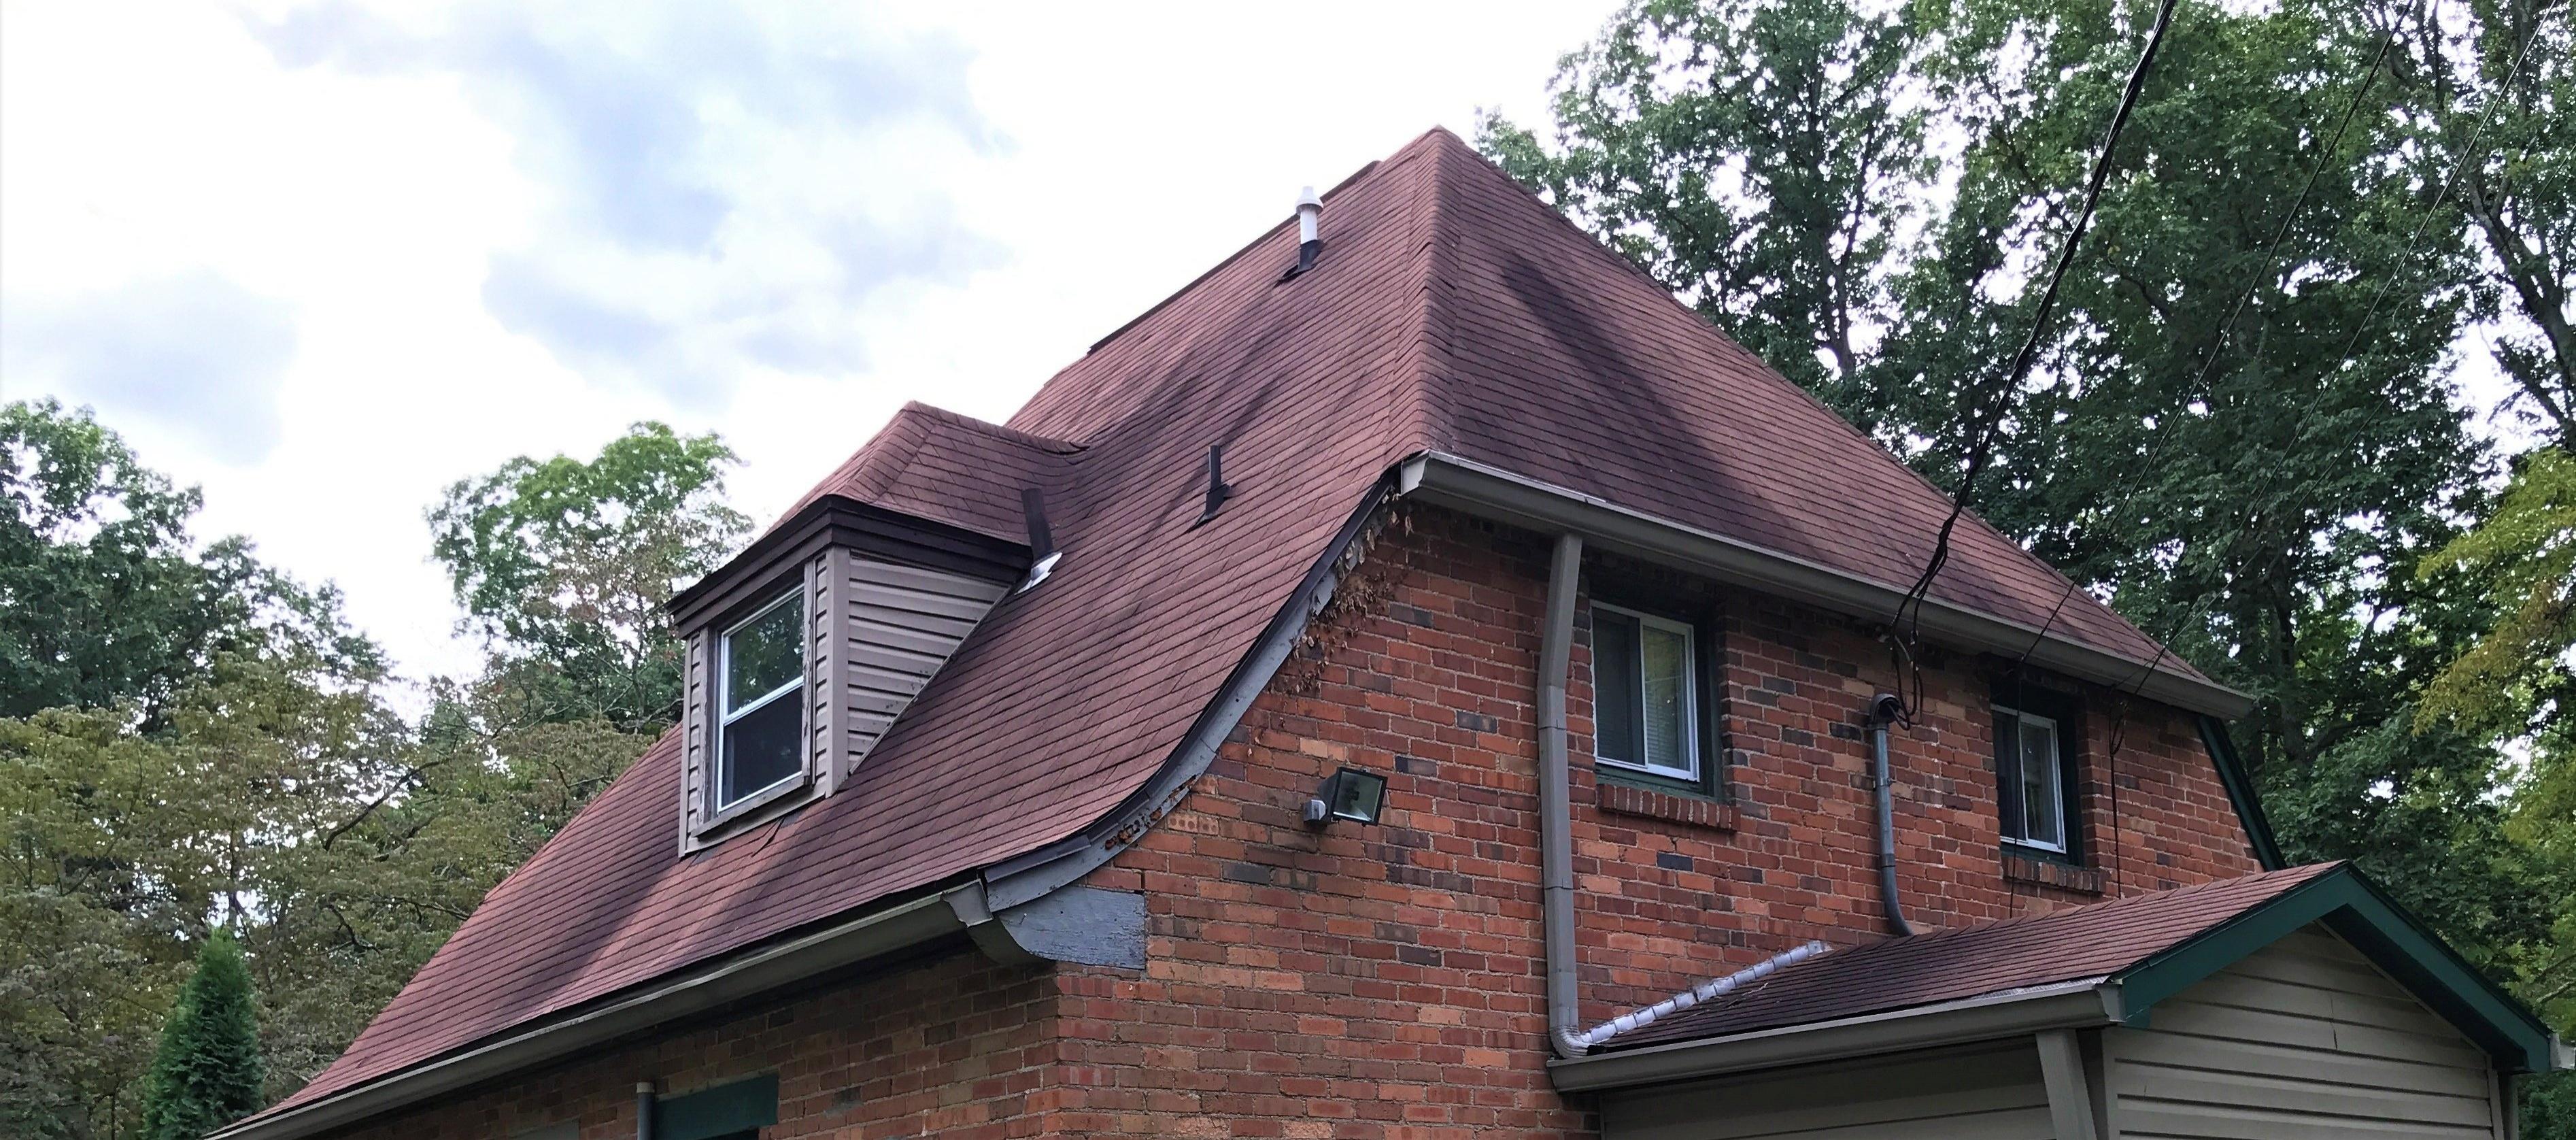 Shingle Roof Repair Dimensional Shingles v2-Clifty-749095-edited-864236-edited